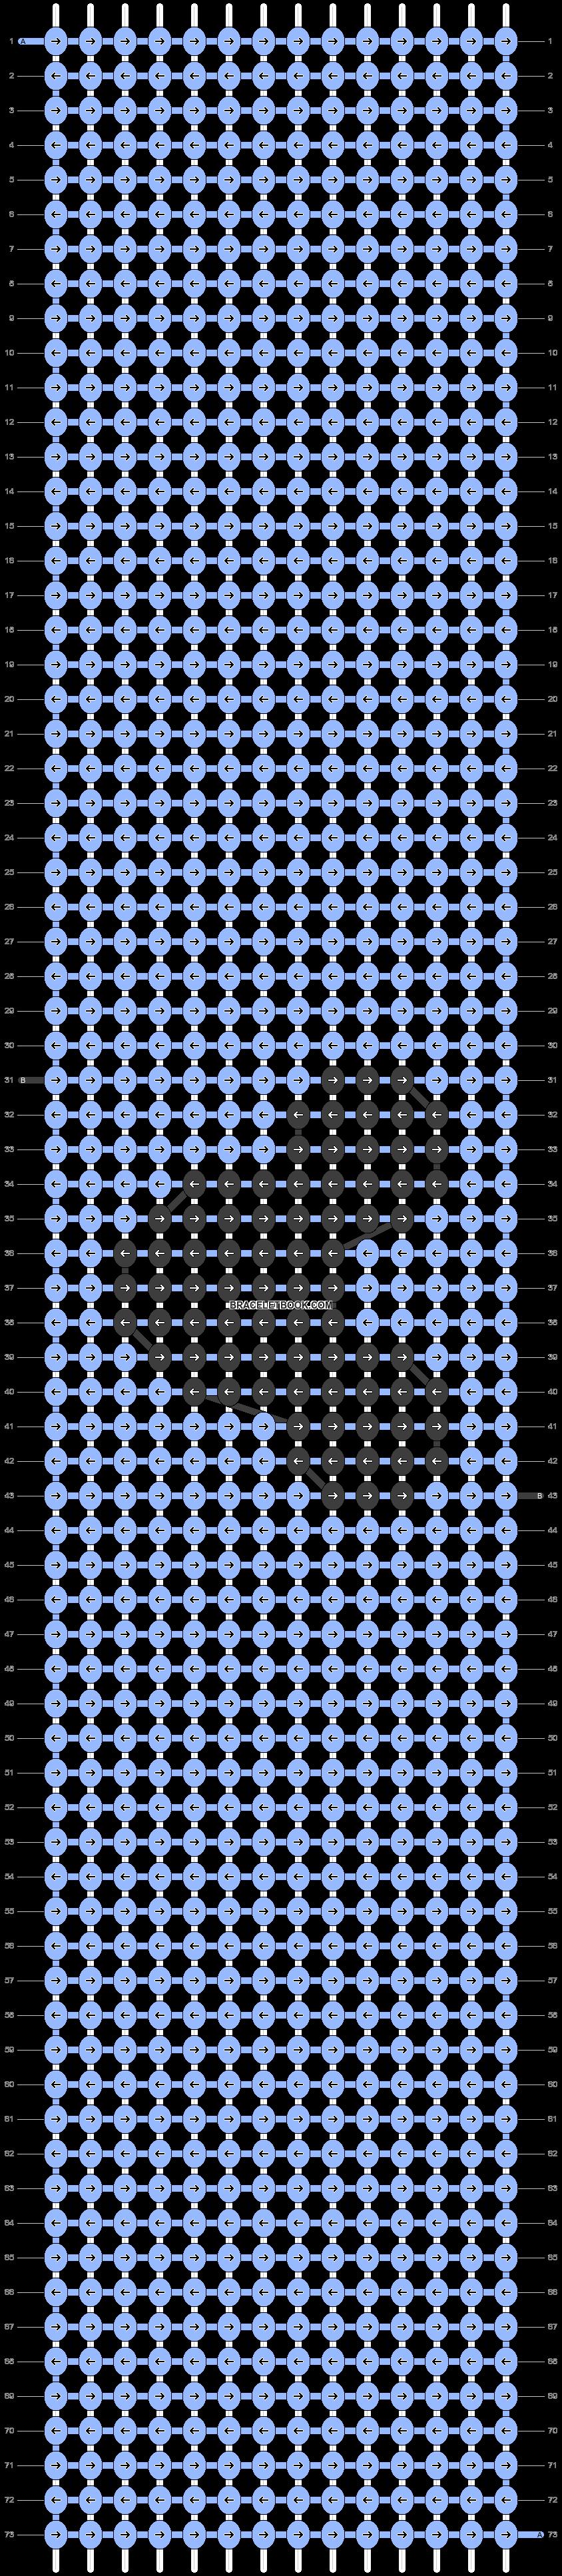 Alpha pattern #54139 pattern